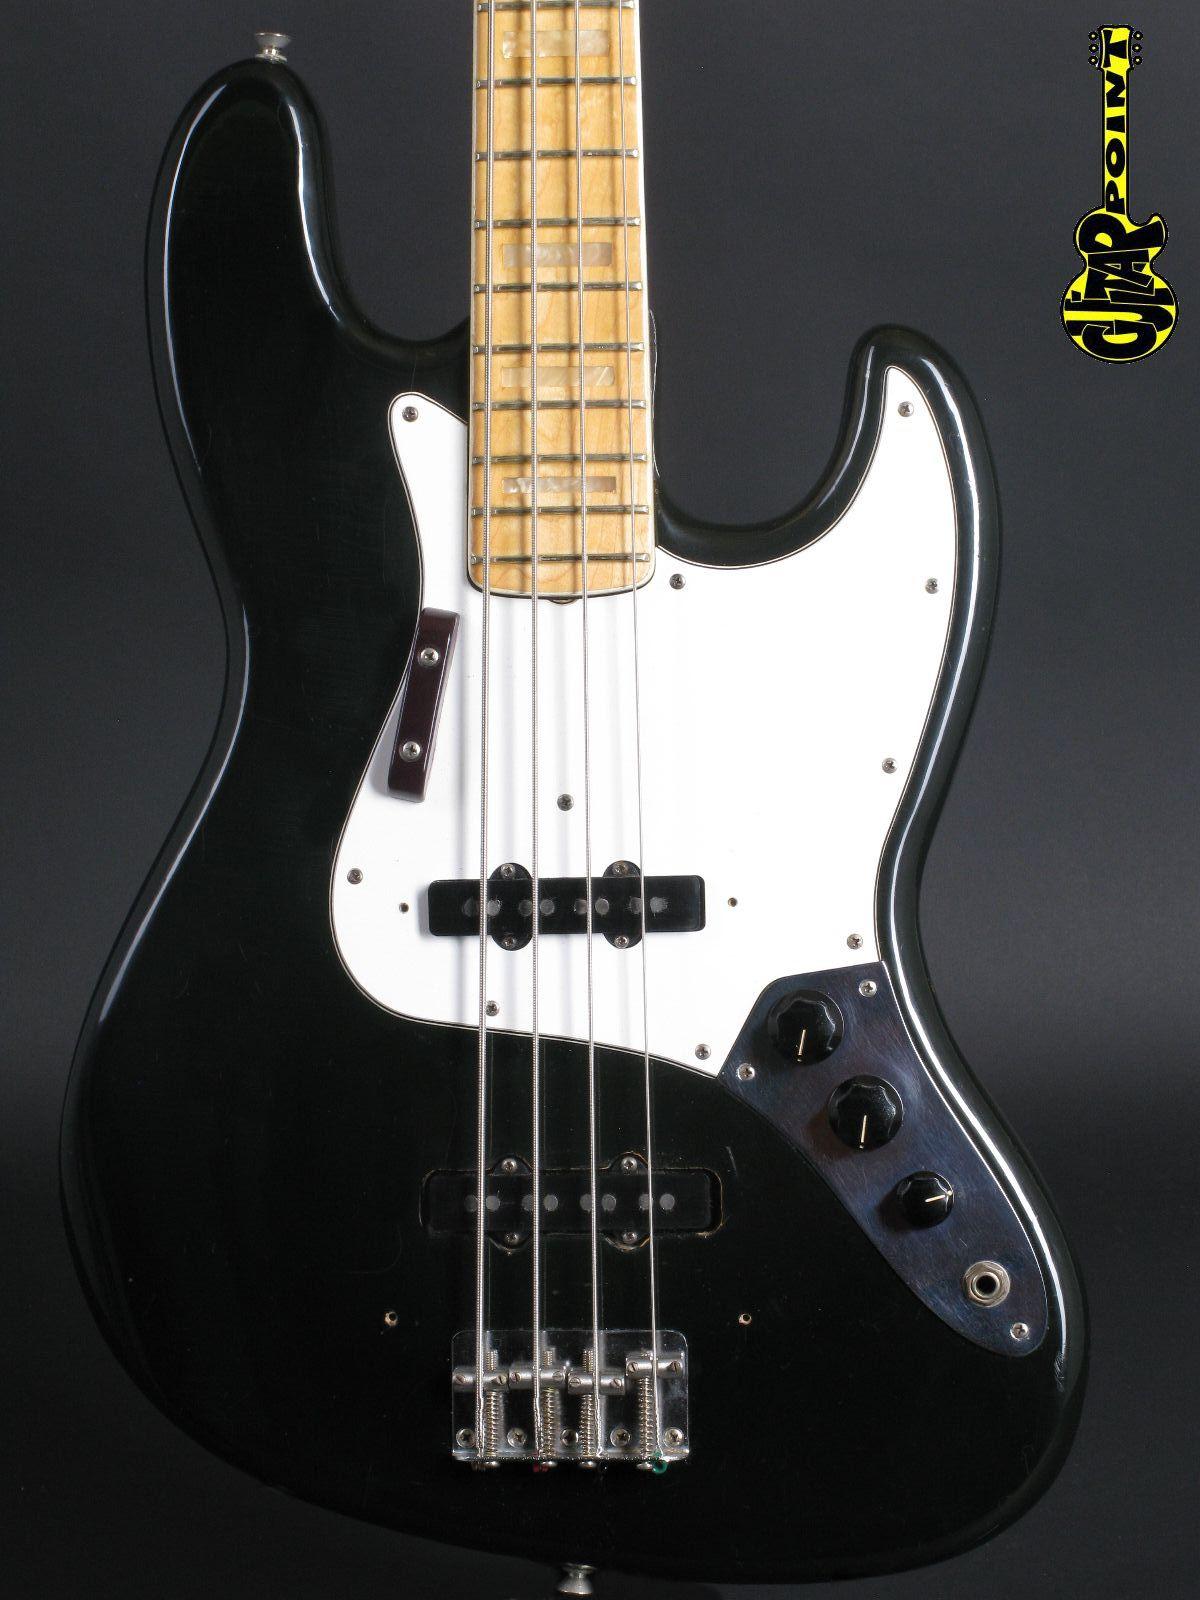 1974 Fender Jazz Bass - Black -  3,85Kg !!!